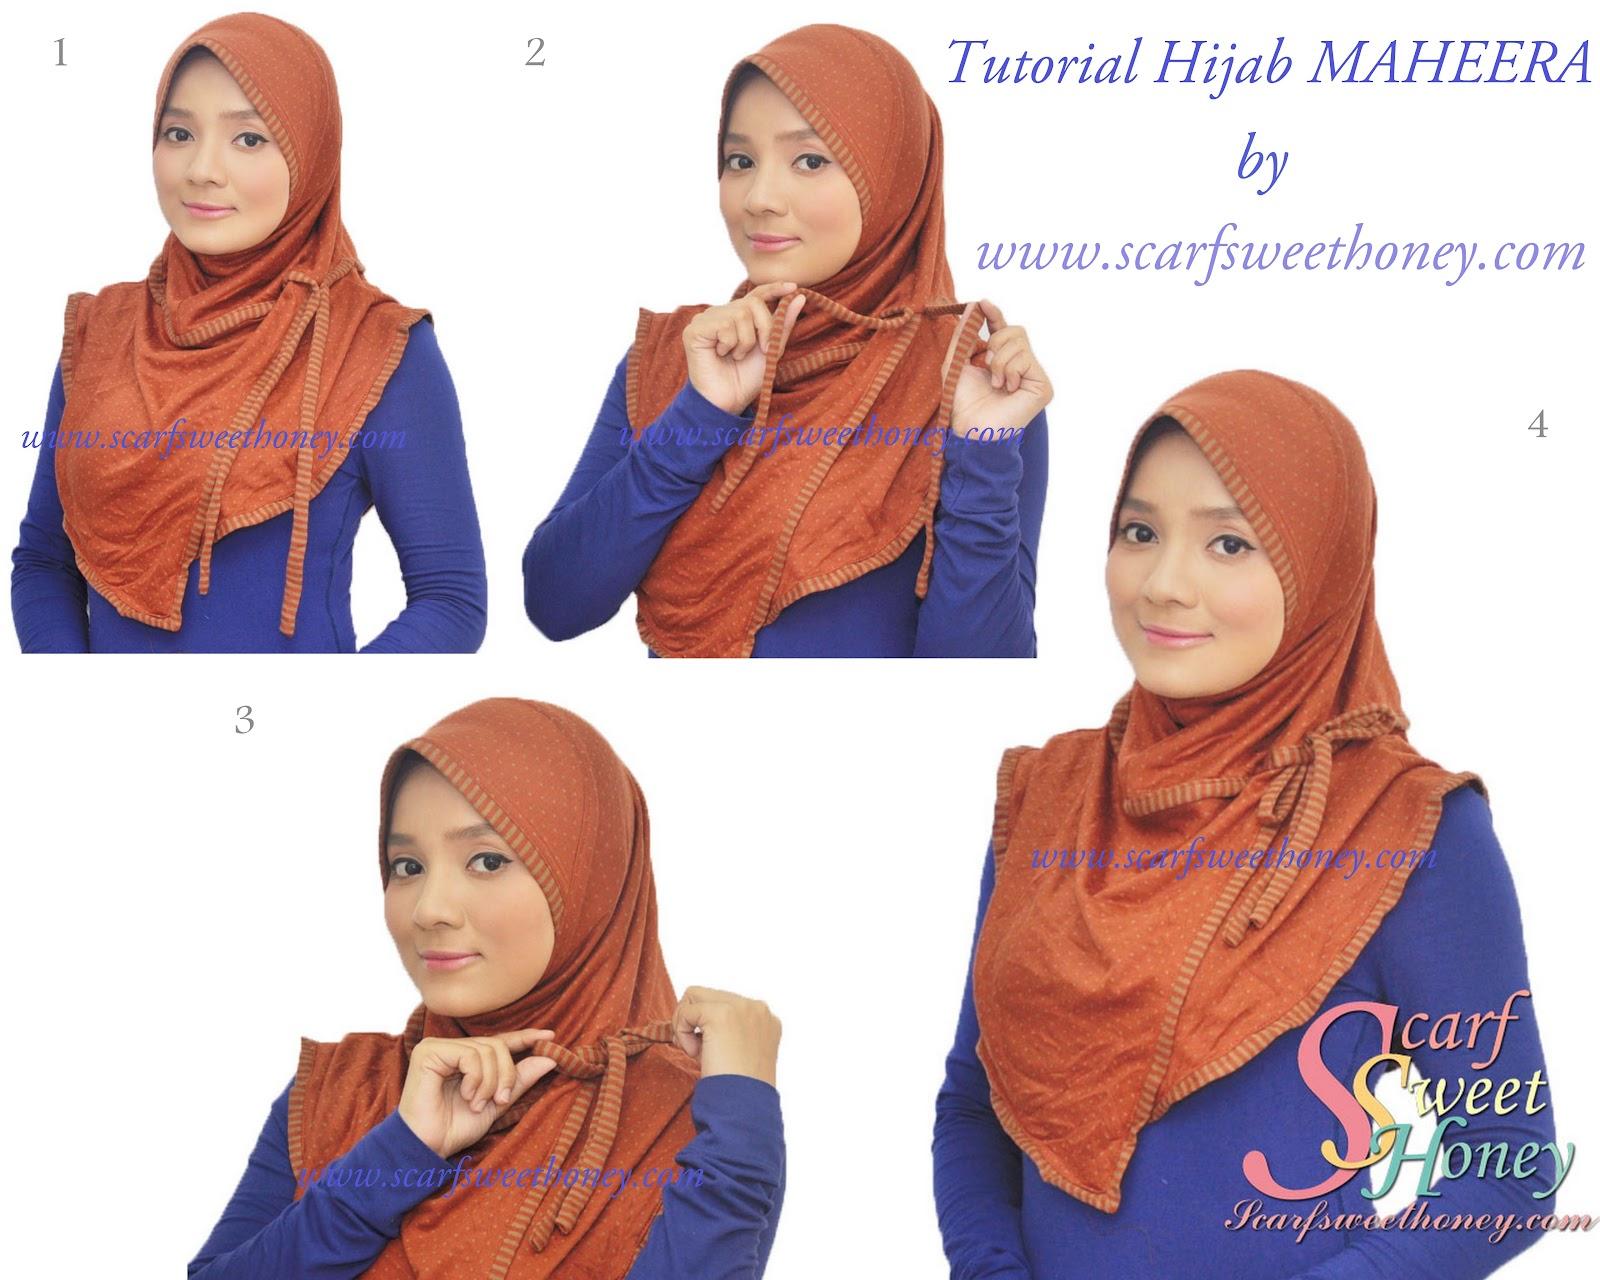 Tutorial Hijab Segi Empat Cara Memakai Jilbab Modis Part 2 | hnczcyw ...